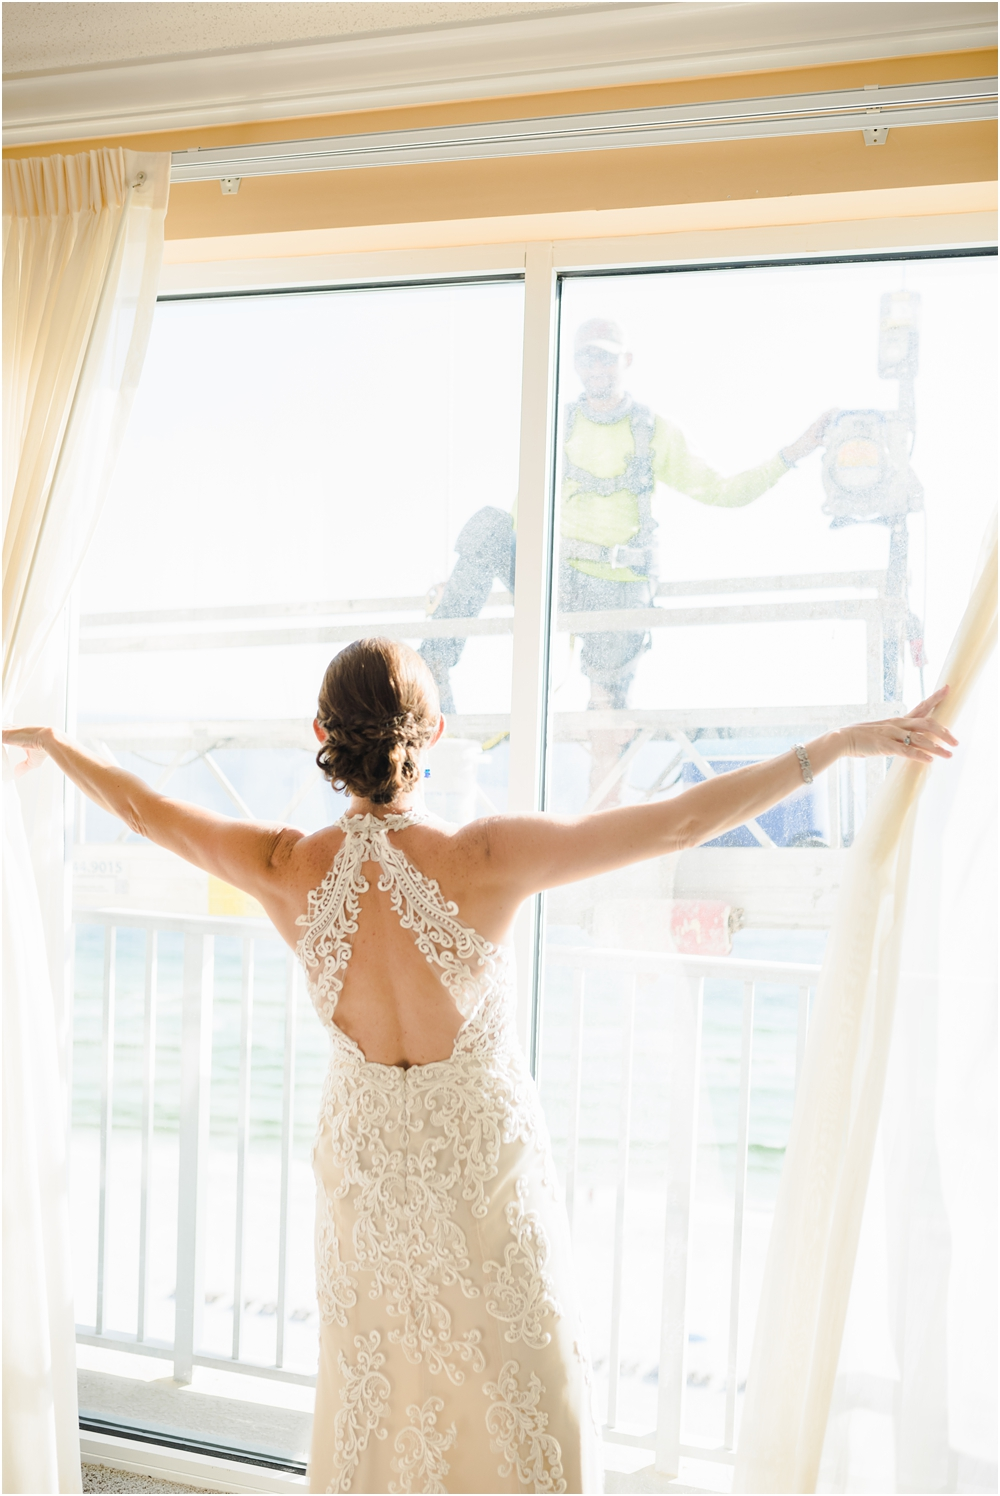 ledman-wedding-kiersten-stevenson-photography-30a-panama-city-beach-dothan-tallahassee-(99-of-763).JPG